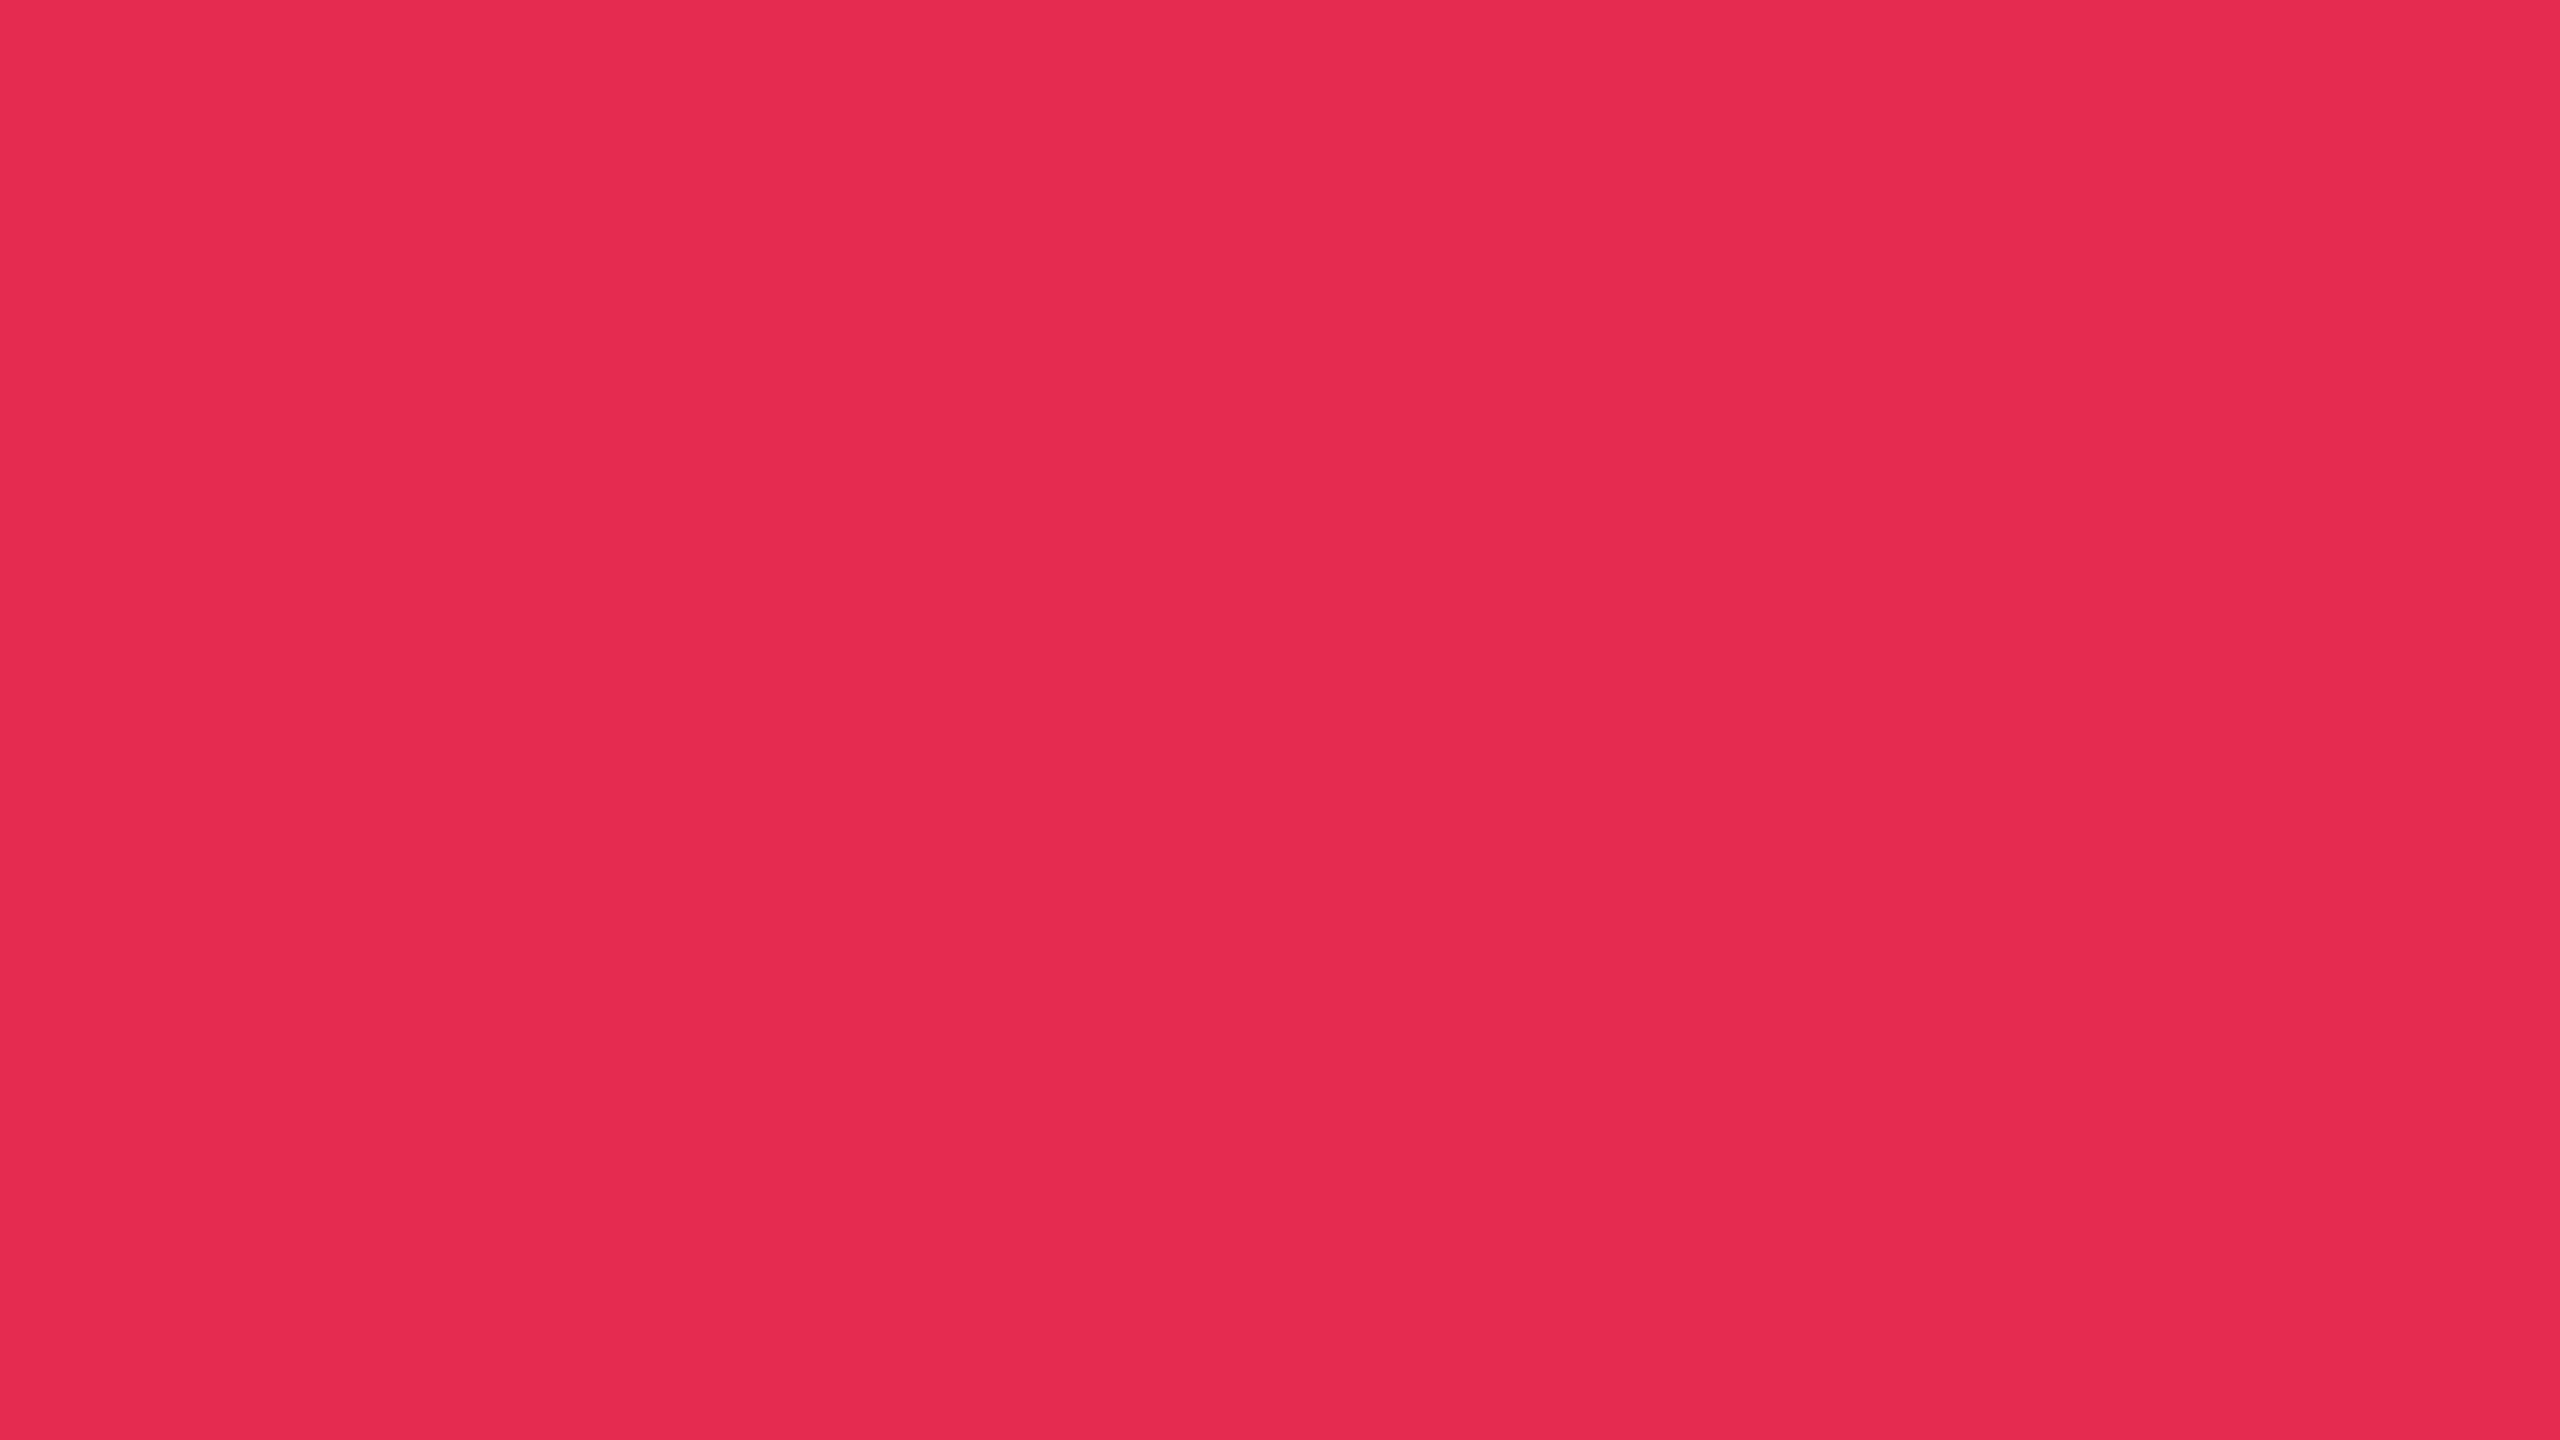 2560x1440 Amaranth Solid Color Background